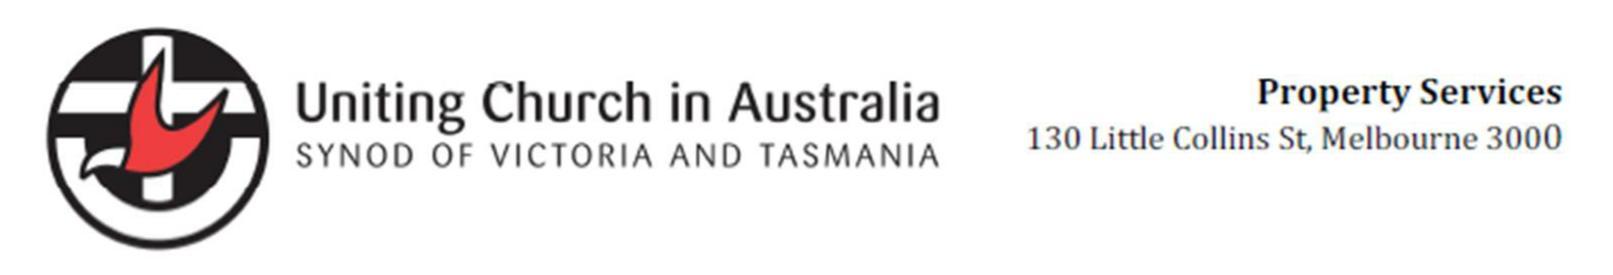 prop-service-logo